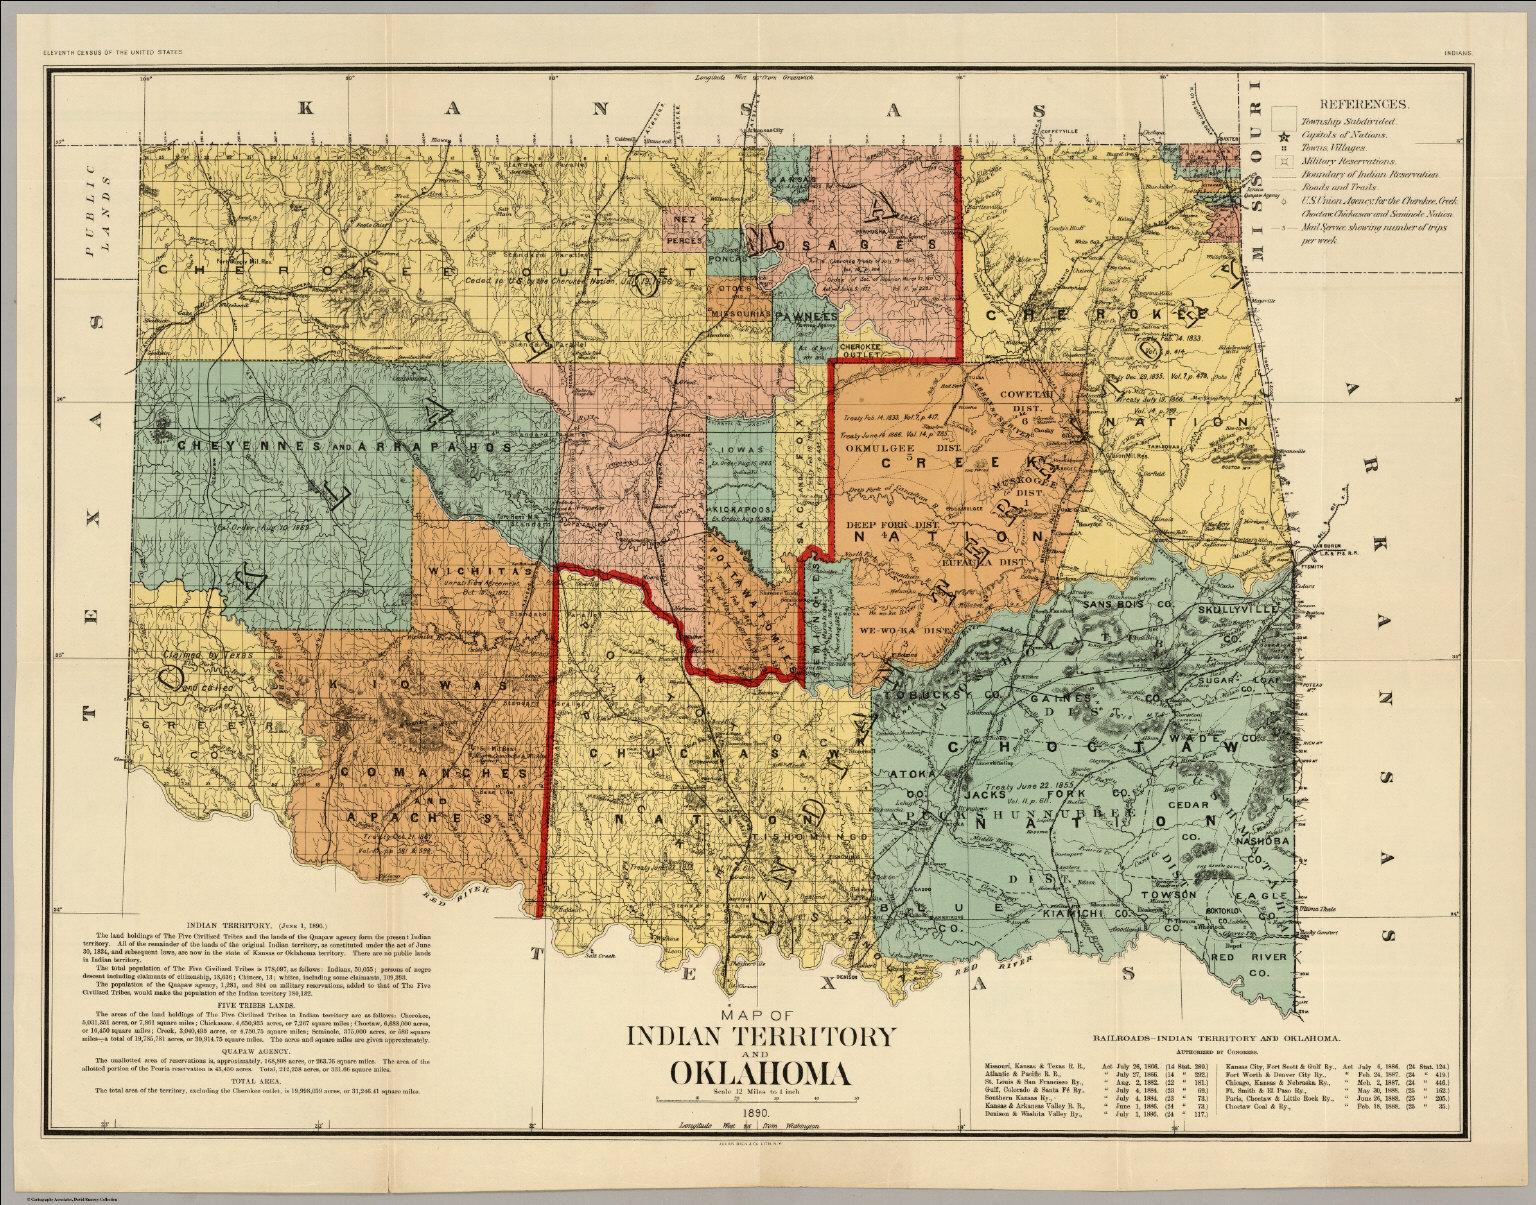 oklahoma indian territory1890 8